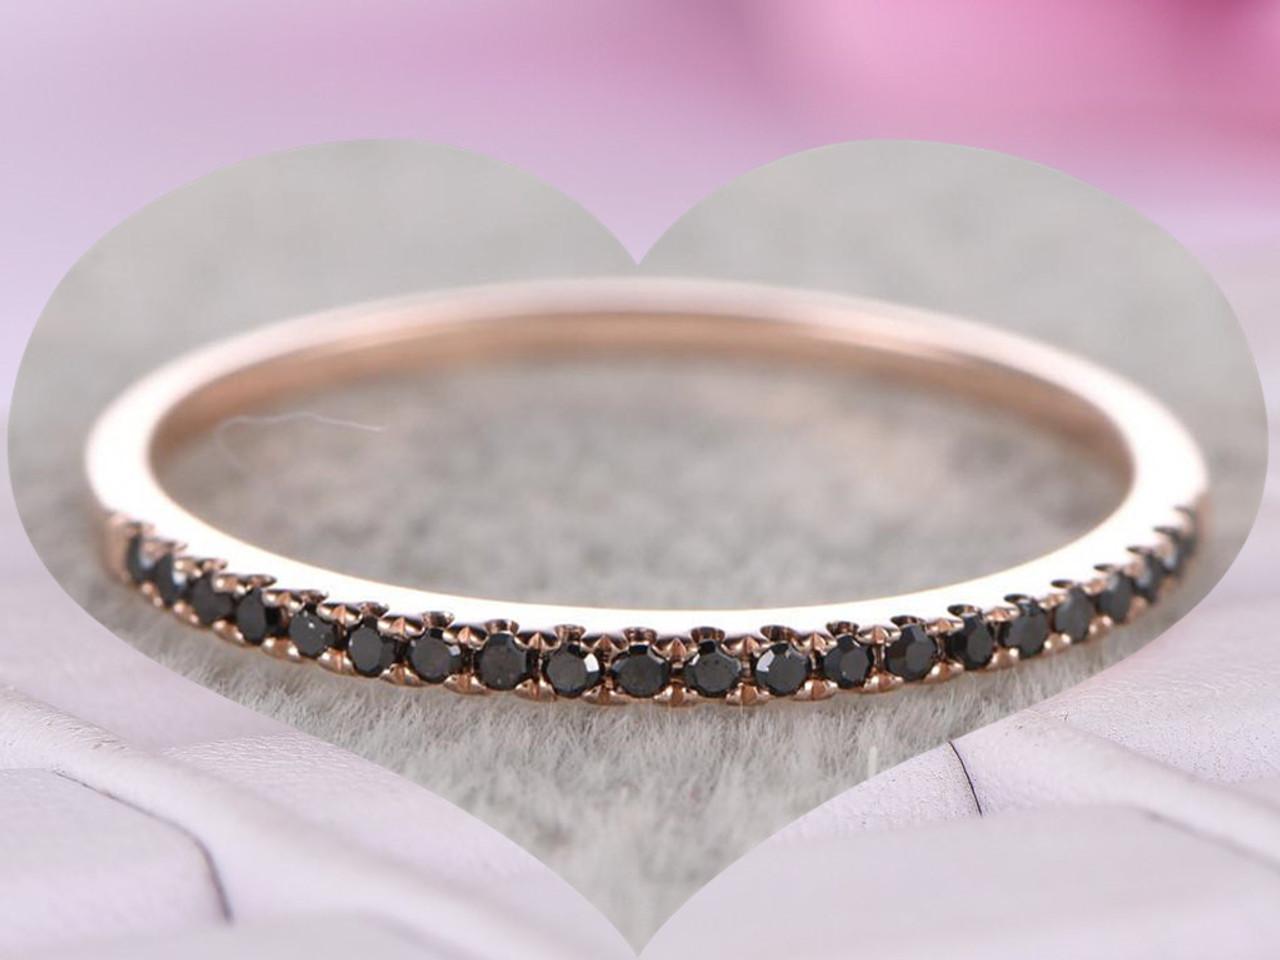 Black Diamond Wedding Band.Pave Black Diamond Wedding Band Half Eternity Anniversary Ring 14k Rose Gold